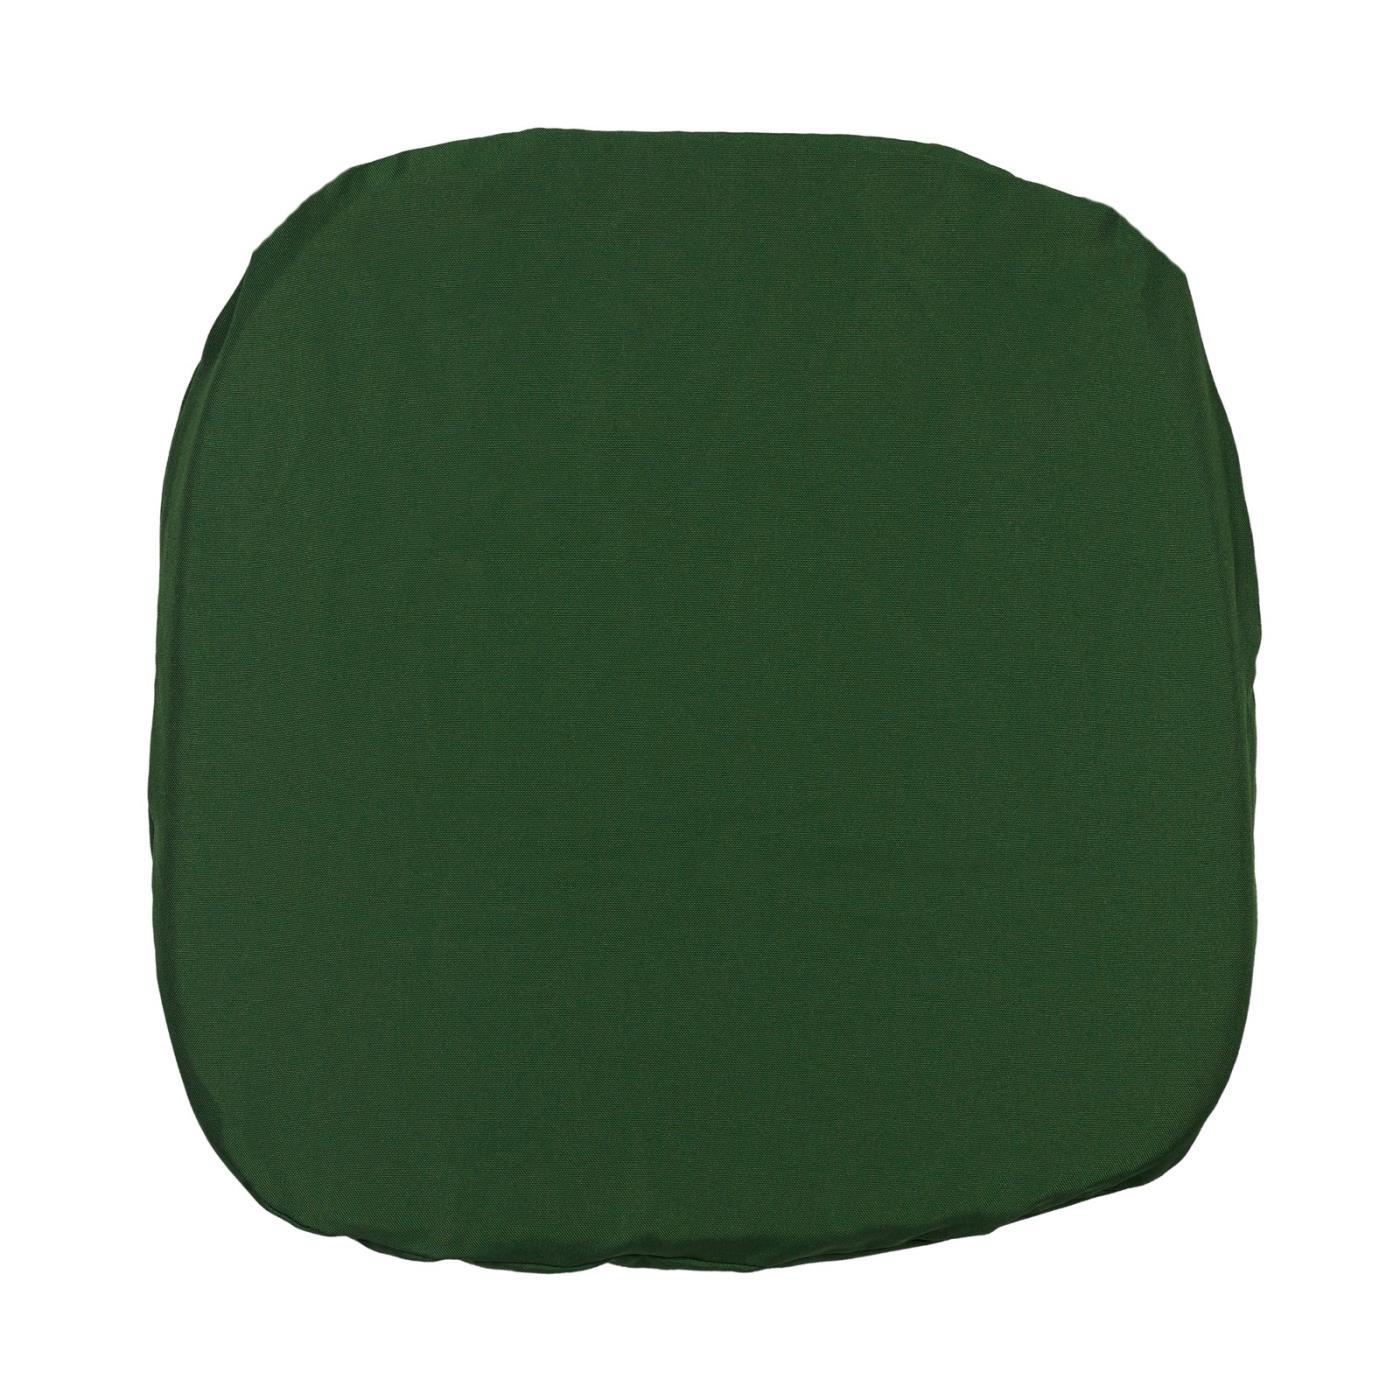 Poly Seat Cushion - Moss